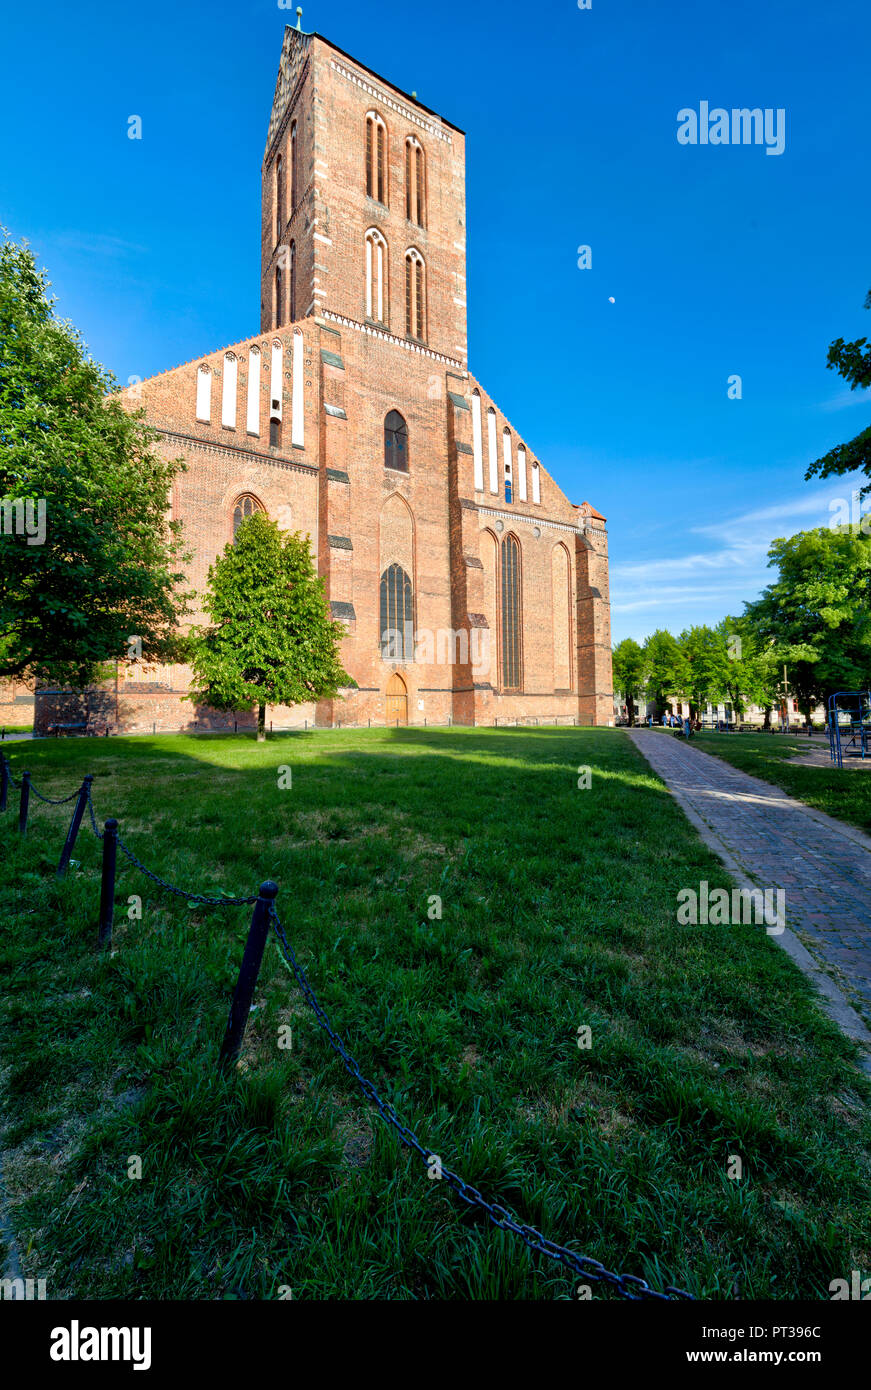 St. Nikolai church, Wismar, Baltic Sea coast, Mecklenburg-Vorpommern, Germany, Europe - Stock Image